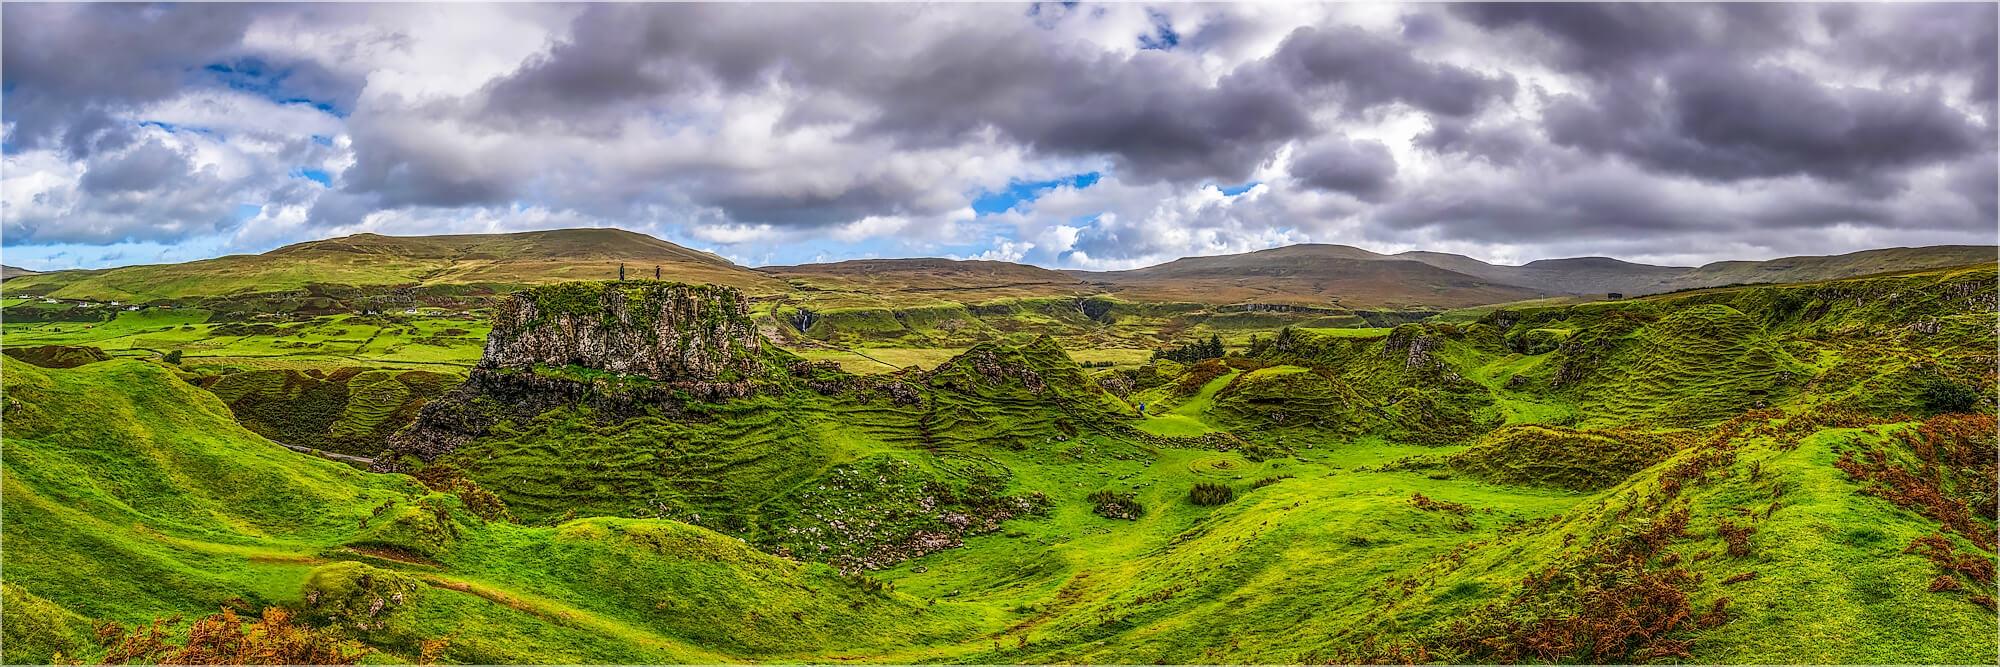 Panoramabild Schottland Isle of Skye Fairy Glen Berge